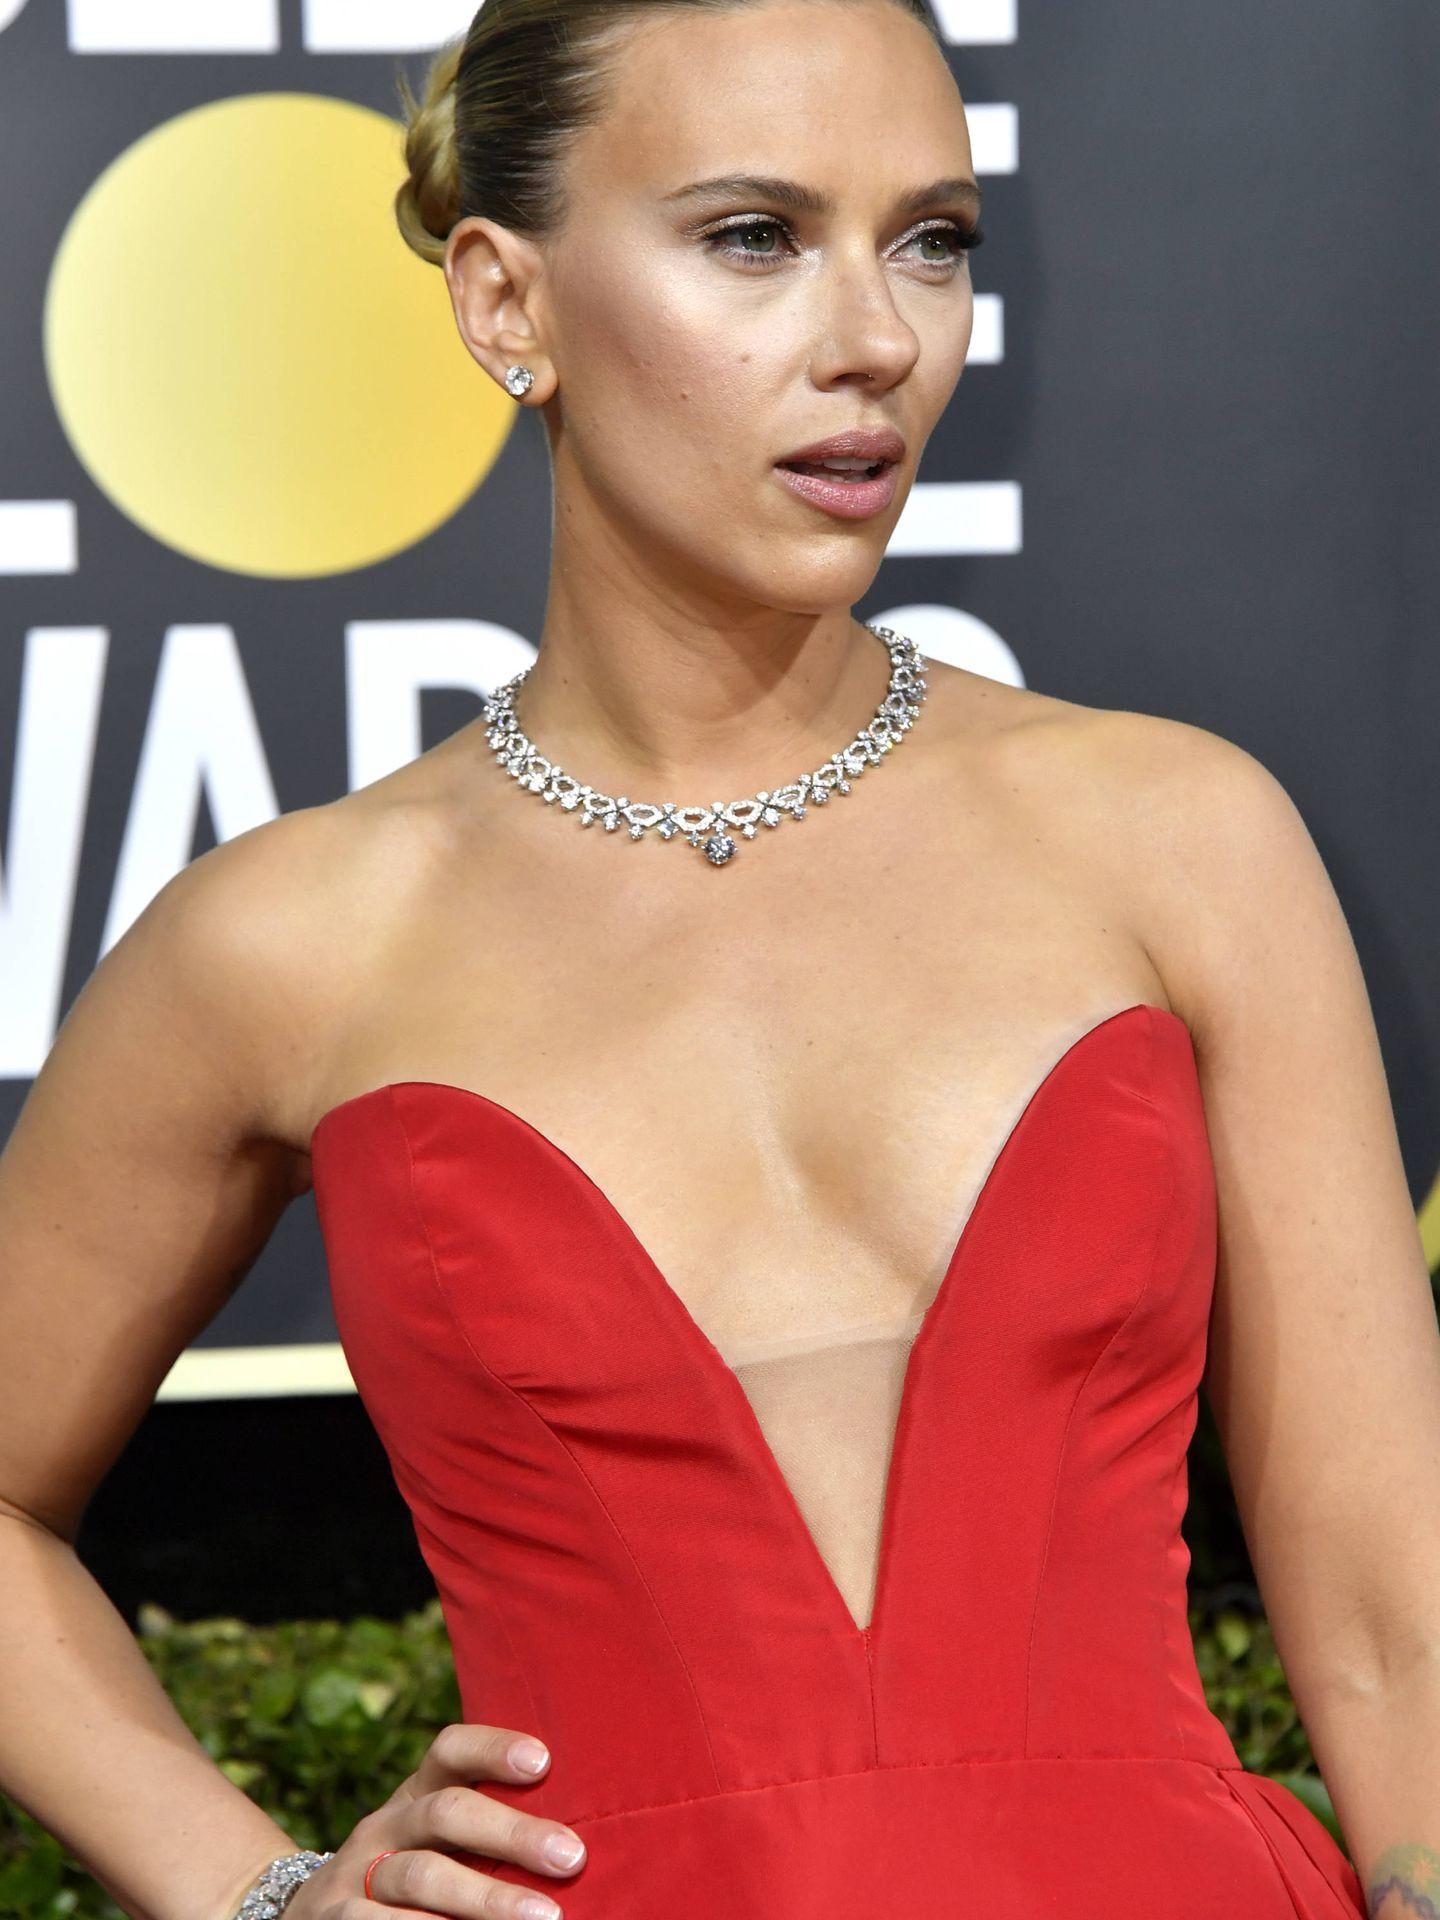 Detalle de la manicura de Scarlett Johansson. (Getty)